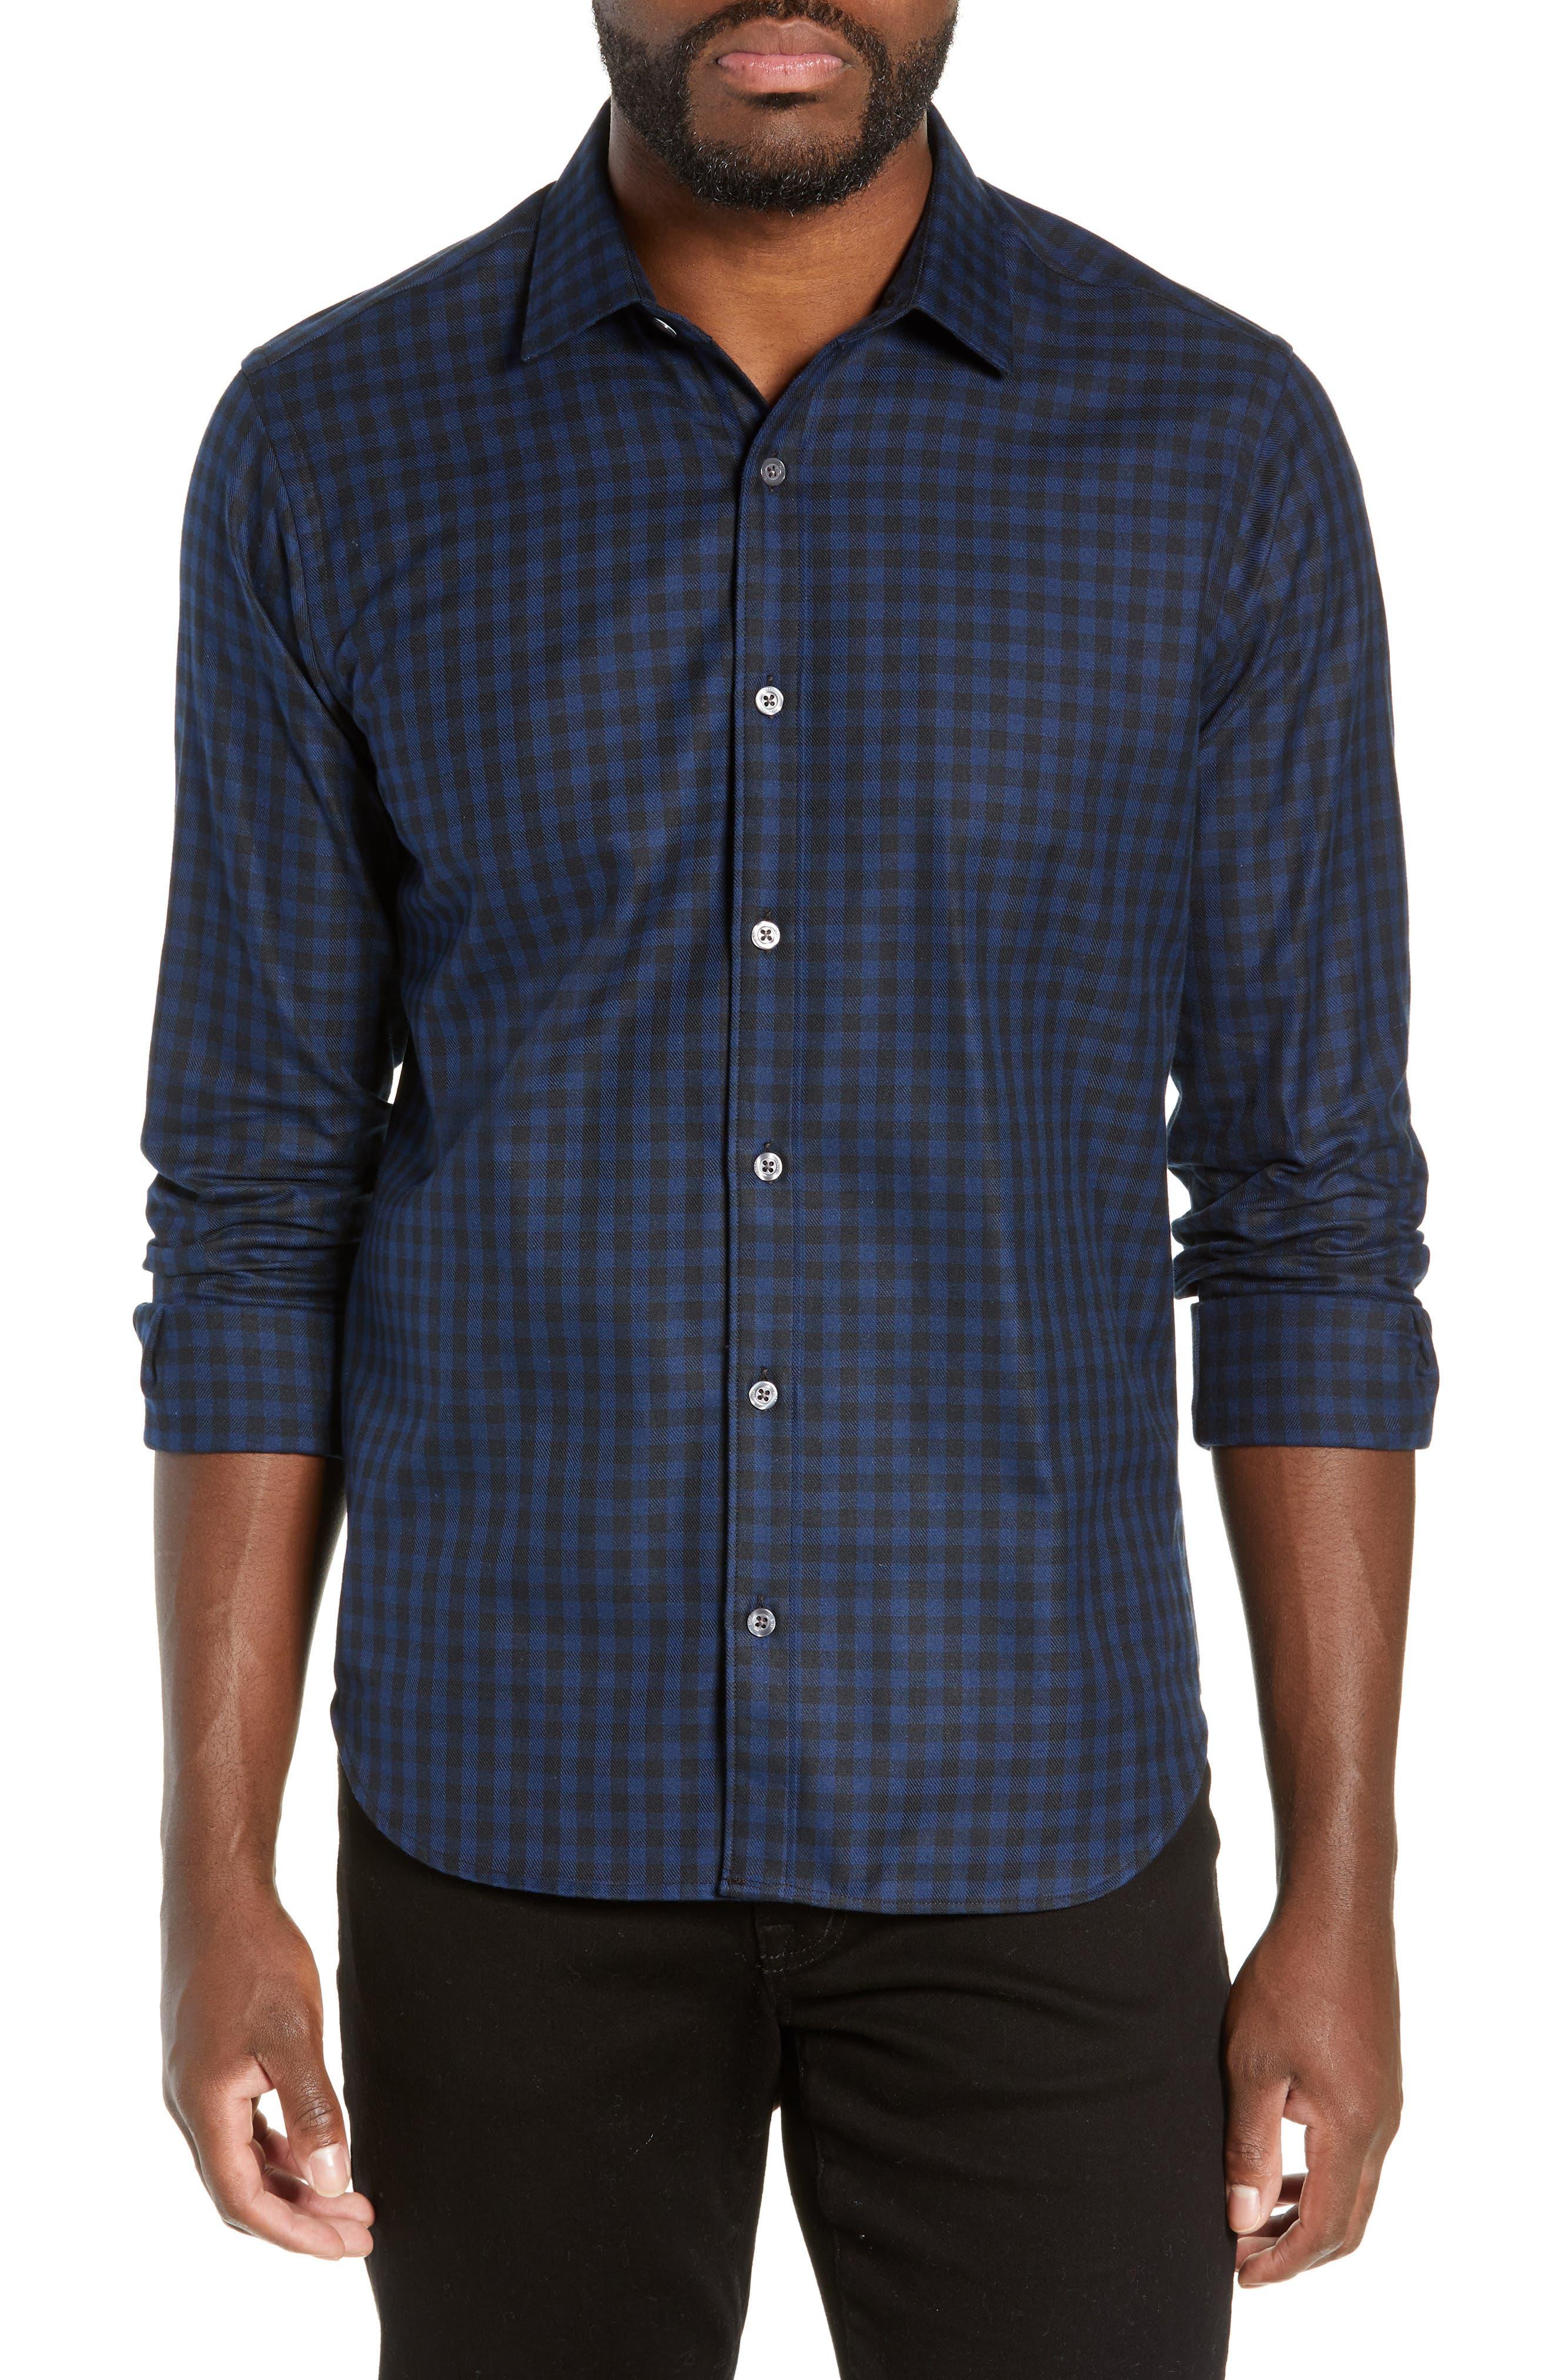 Jeff Buffalo Slim Fit Check Flannel Shirt, Blue